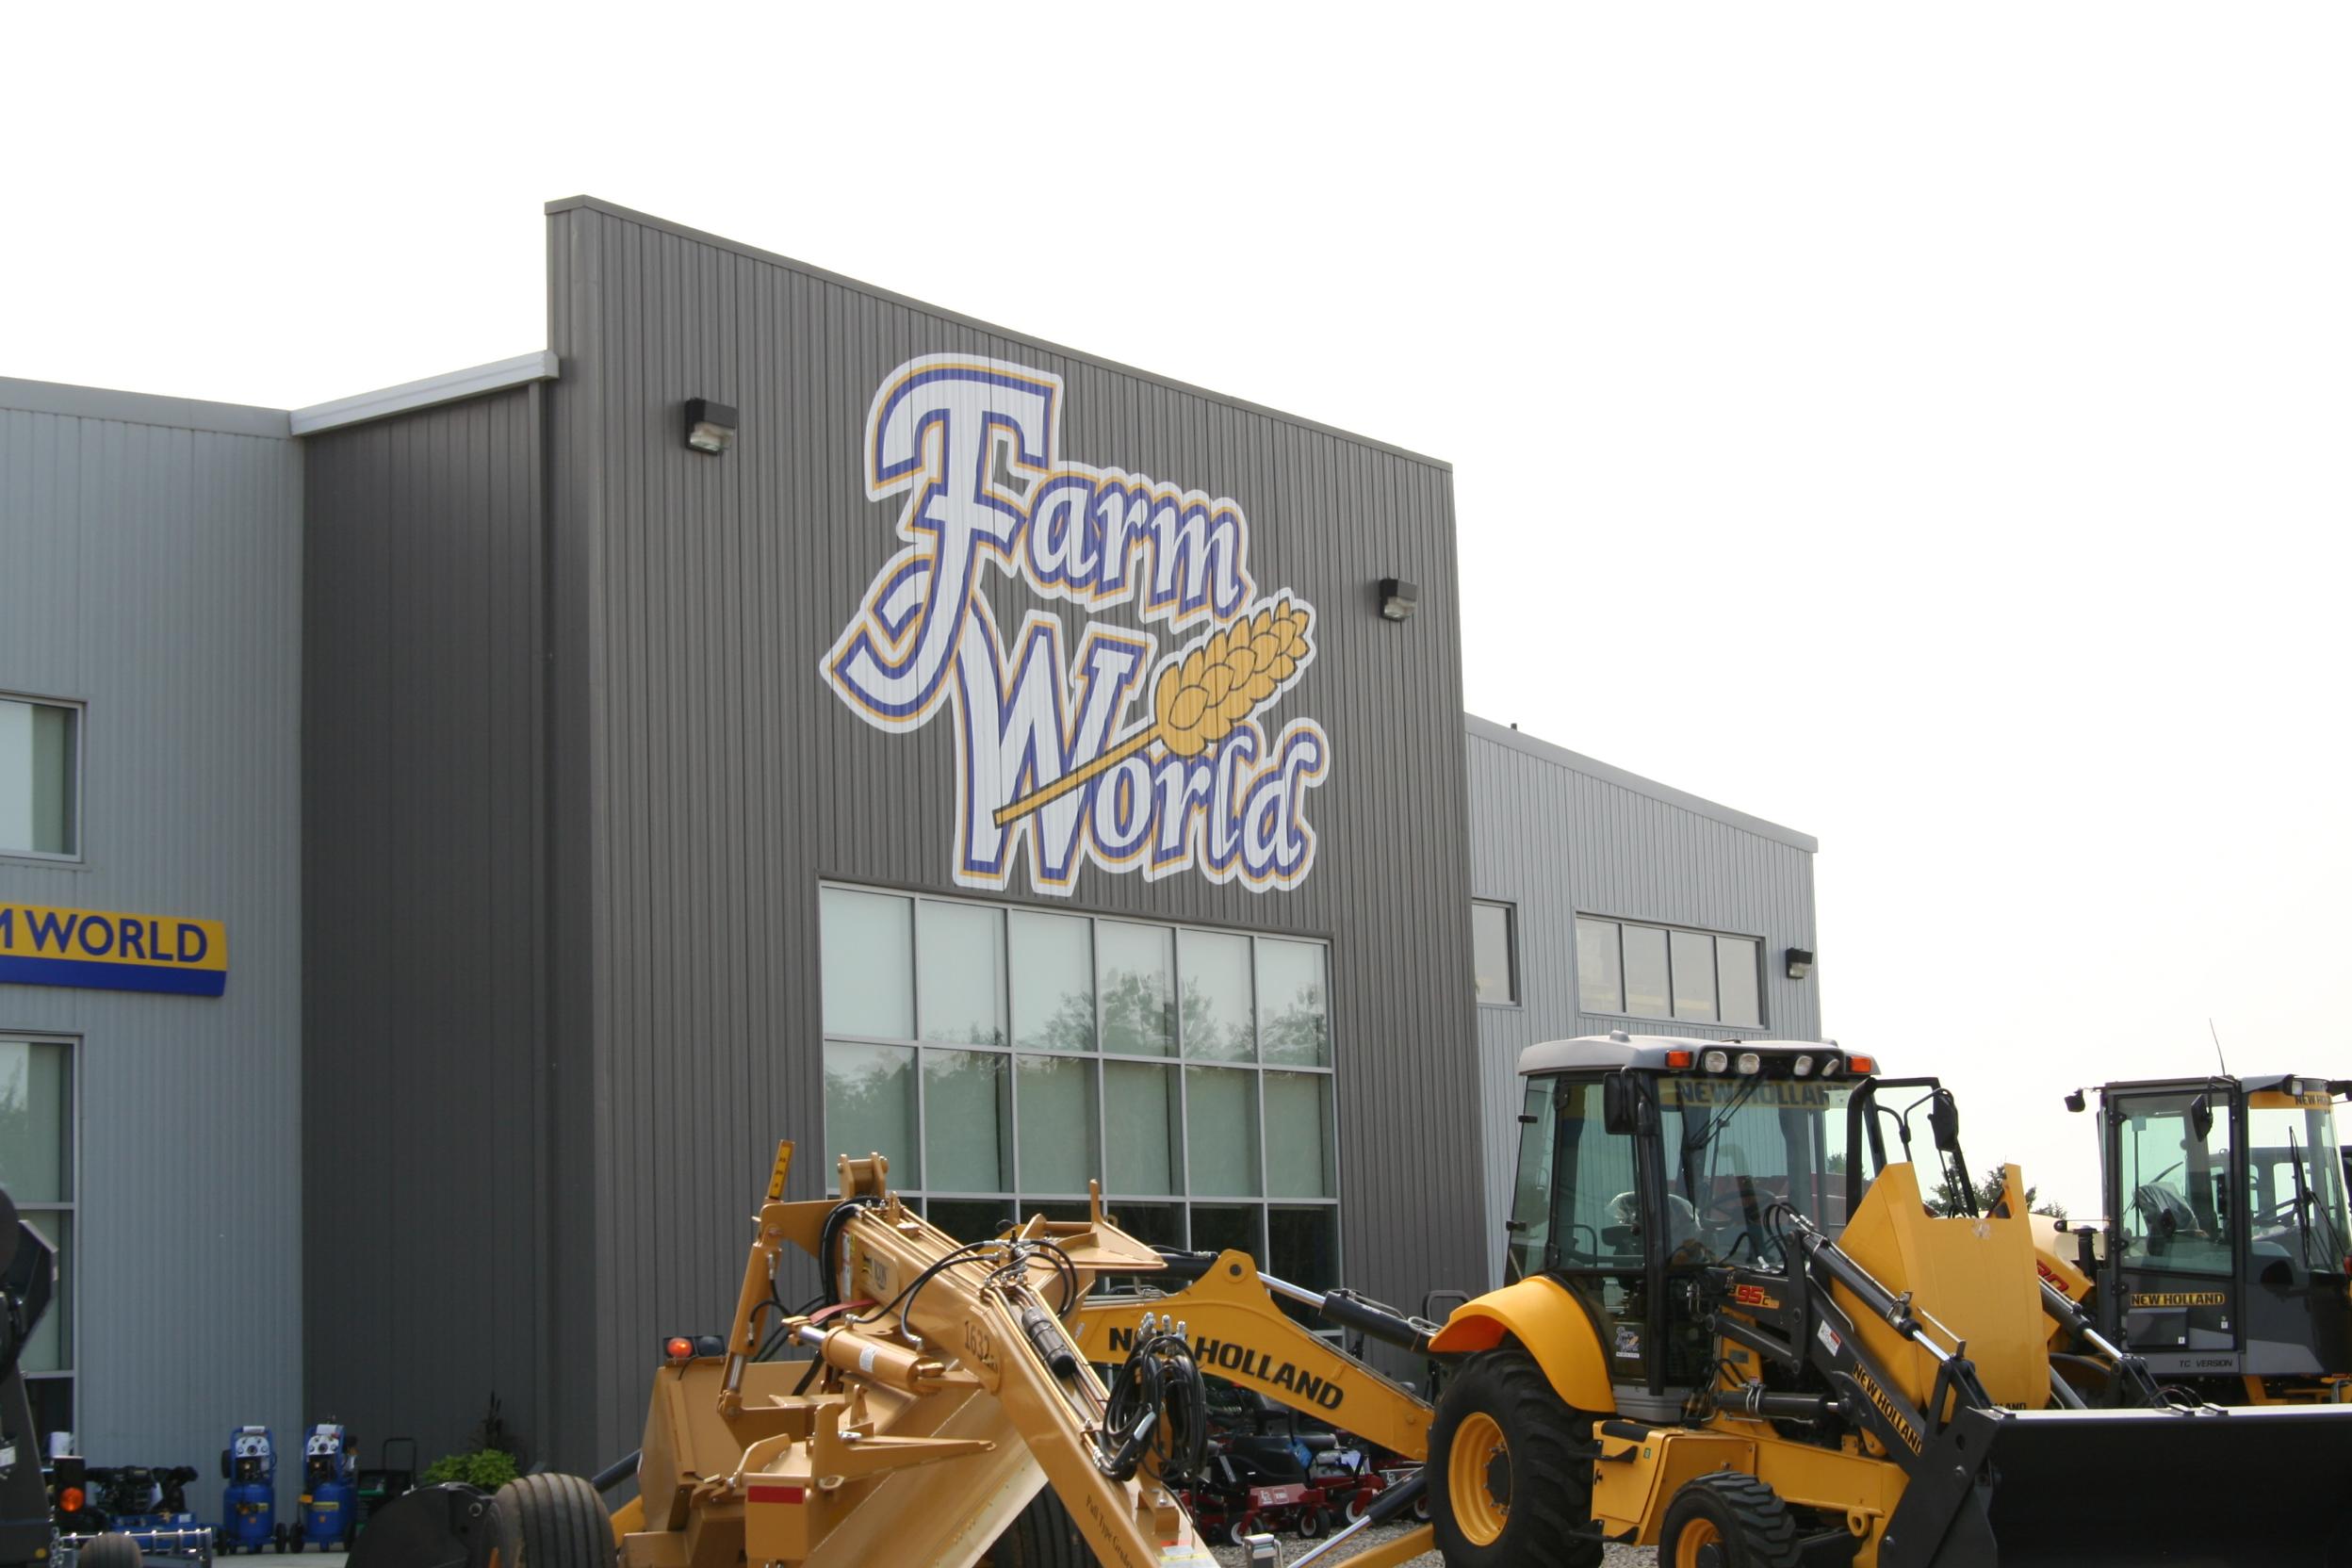 Work at Farm World